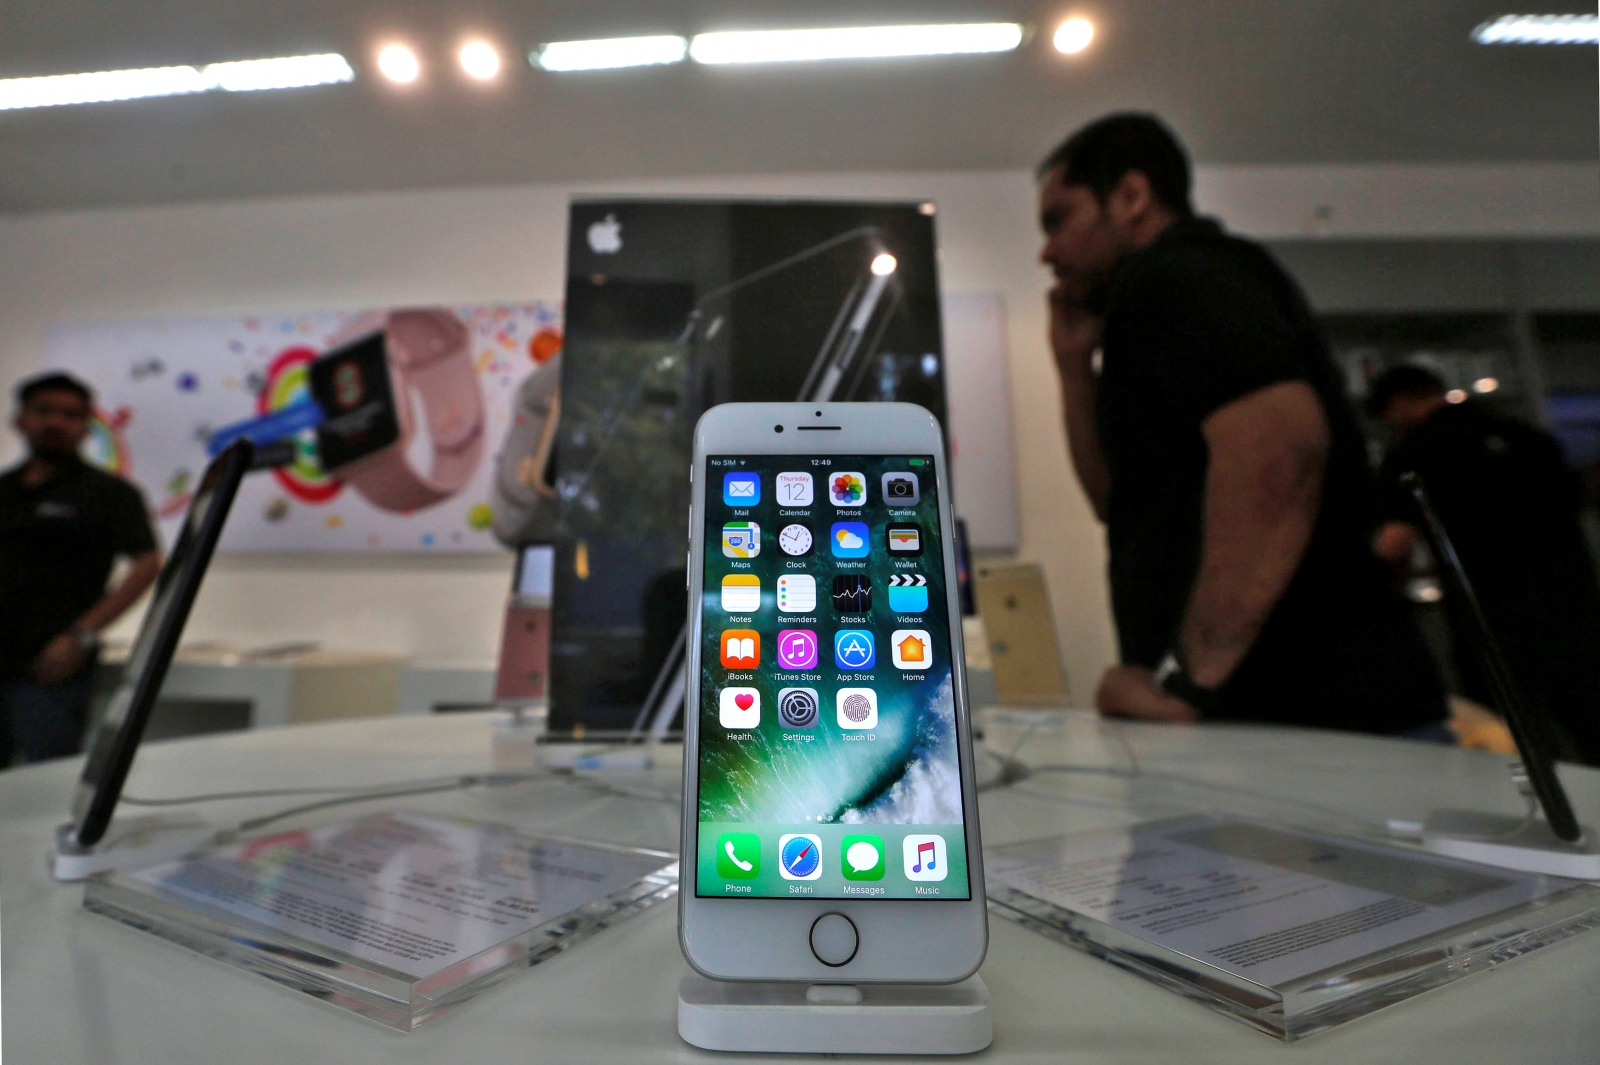 Apple ordered 70 million OLED screen